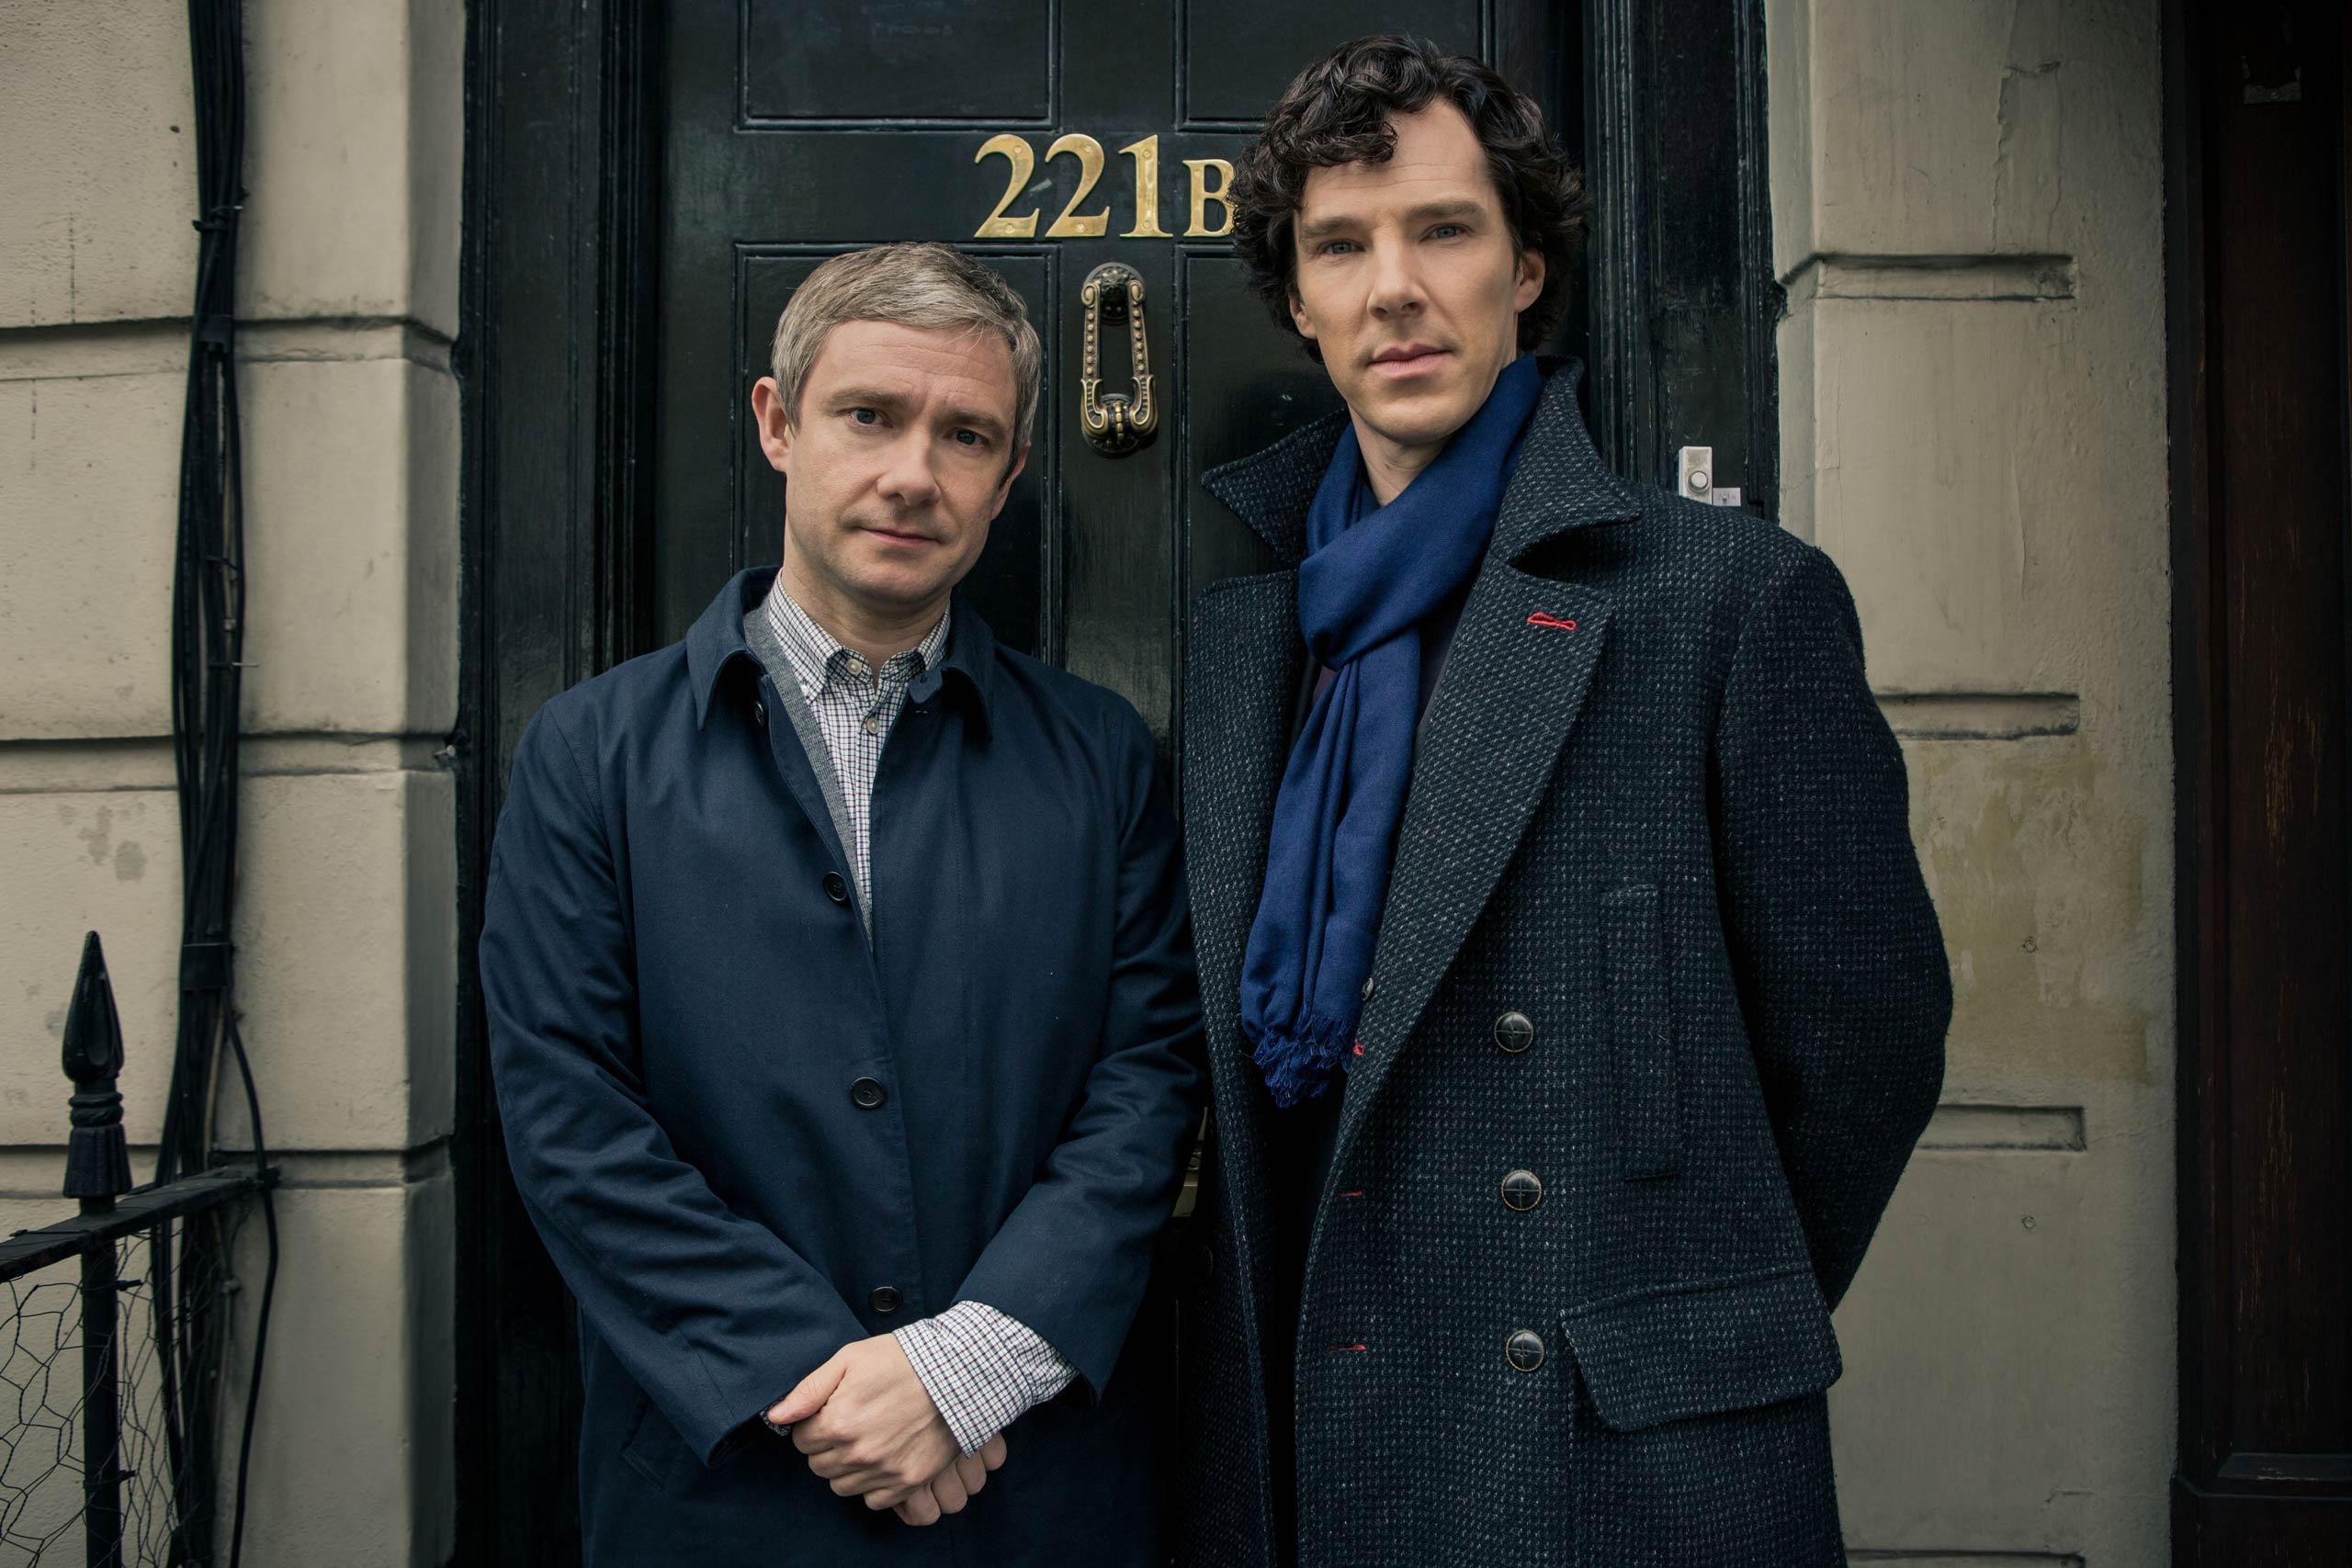 <strong>Dr. John Watson and Sherlock Holmes in <i>Sherlock</i></strong>